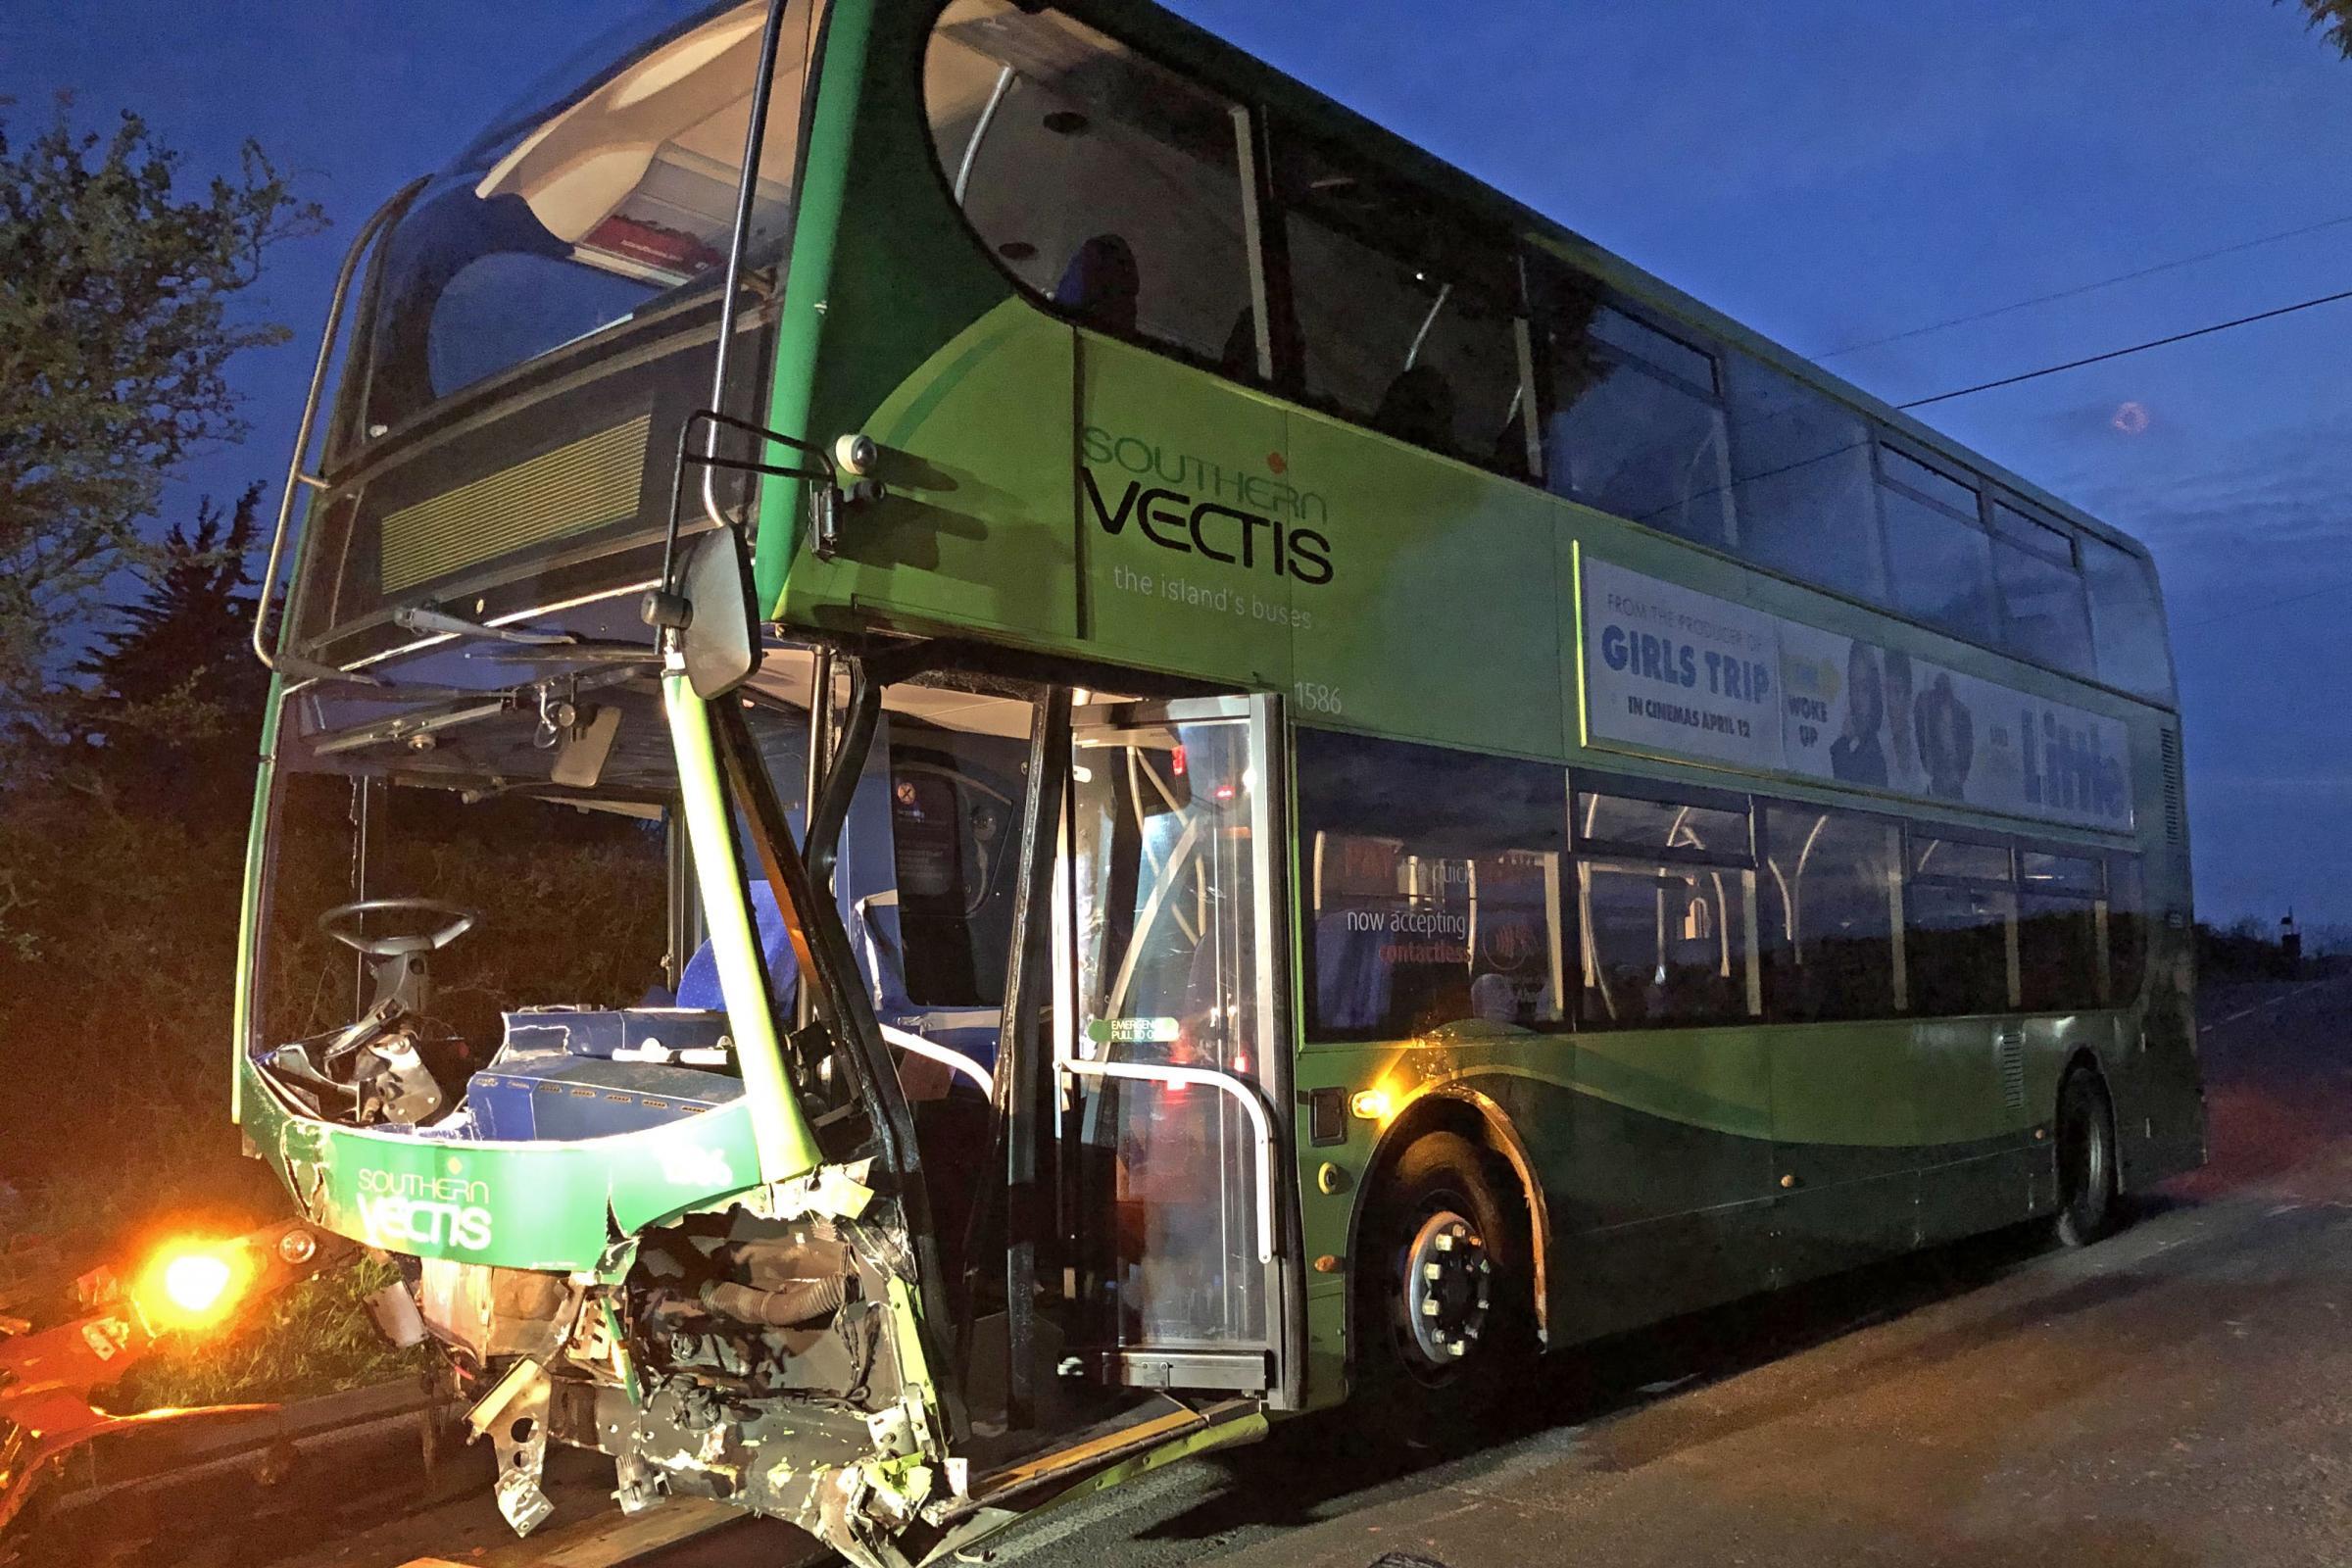 b&q bus tour